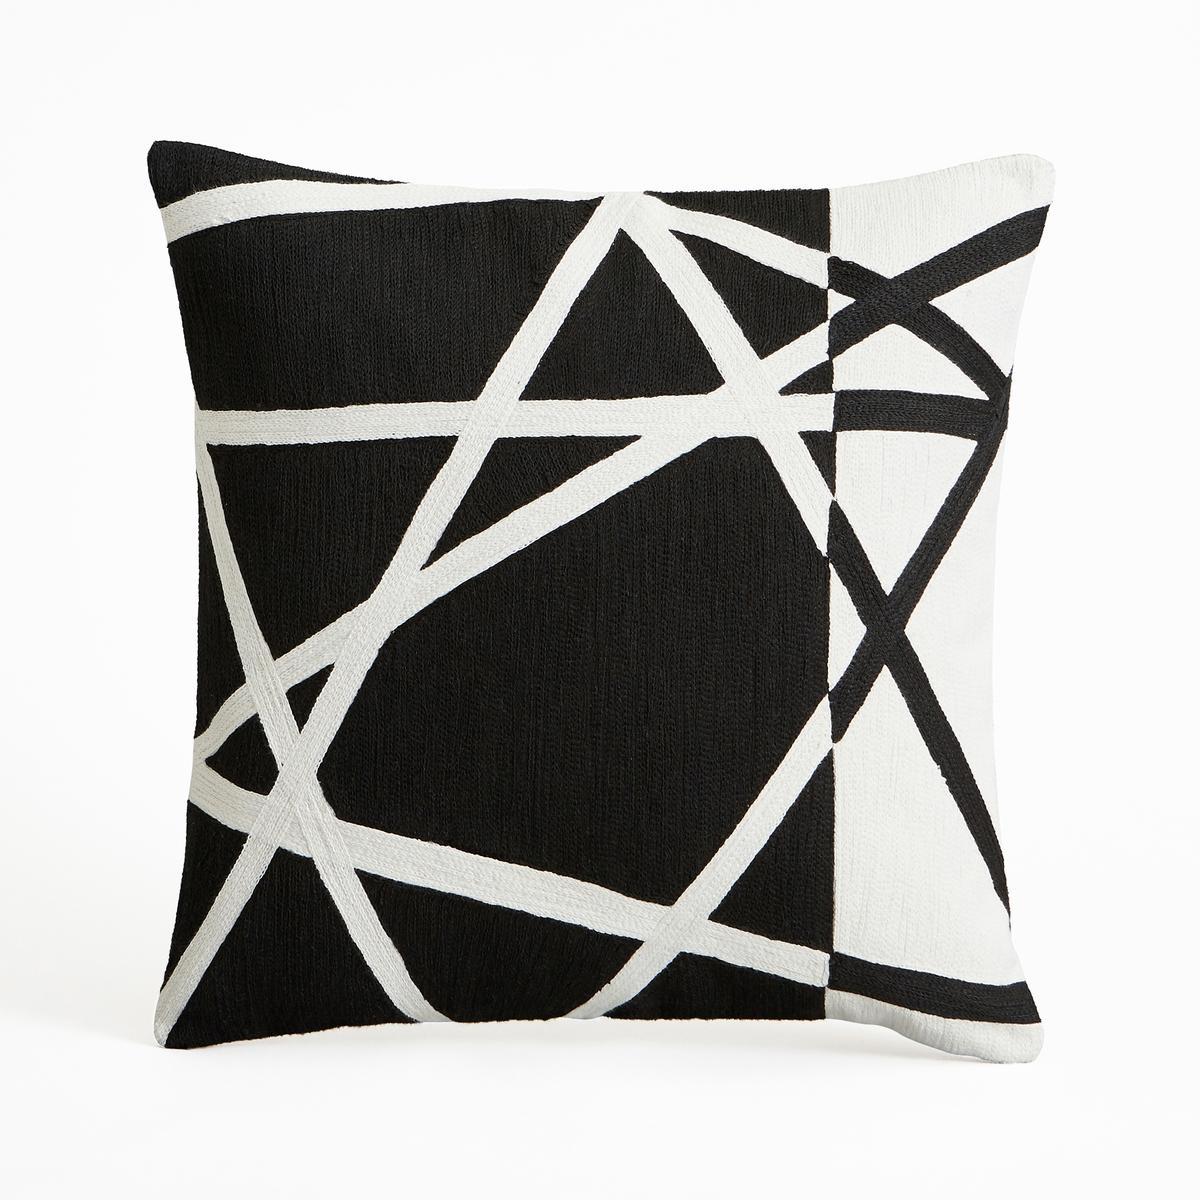 Наволочка на подушку-валик Filadefo<br><br>Цвет: черный/ белый<br>Размер: 40 x 40  см